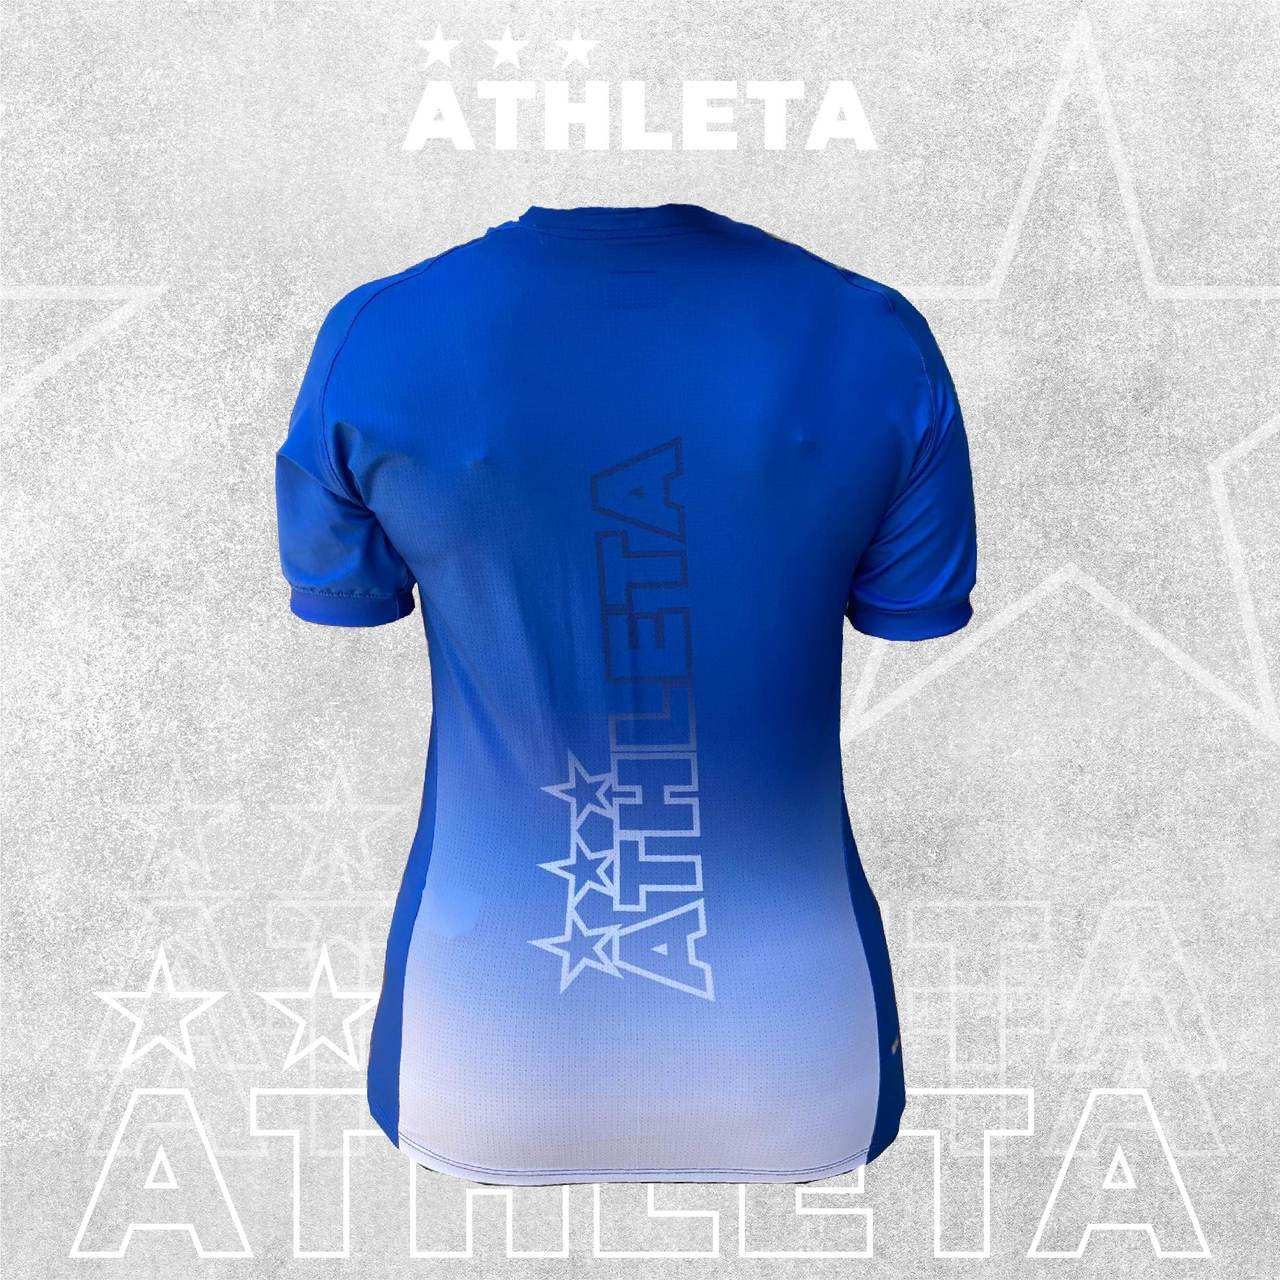 Camiseta Athleta Free Feminino - Azul com Branco